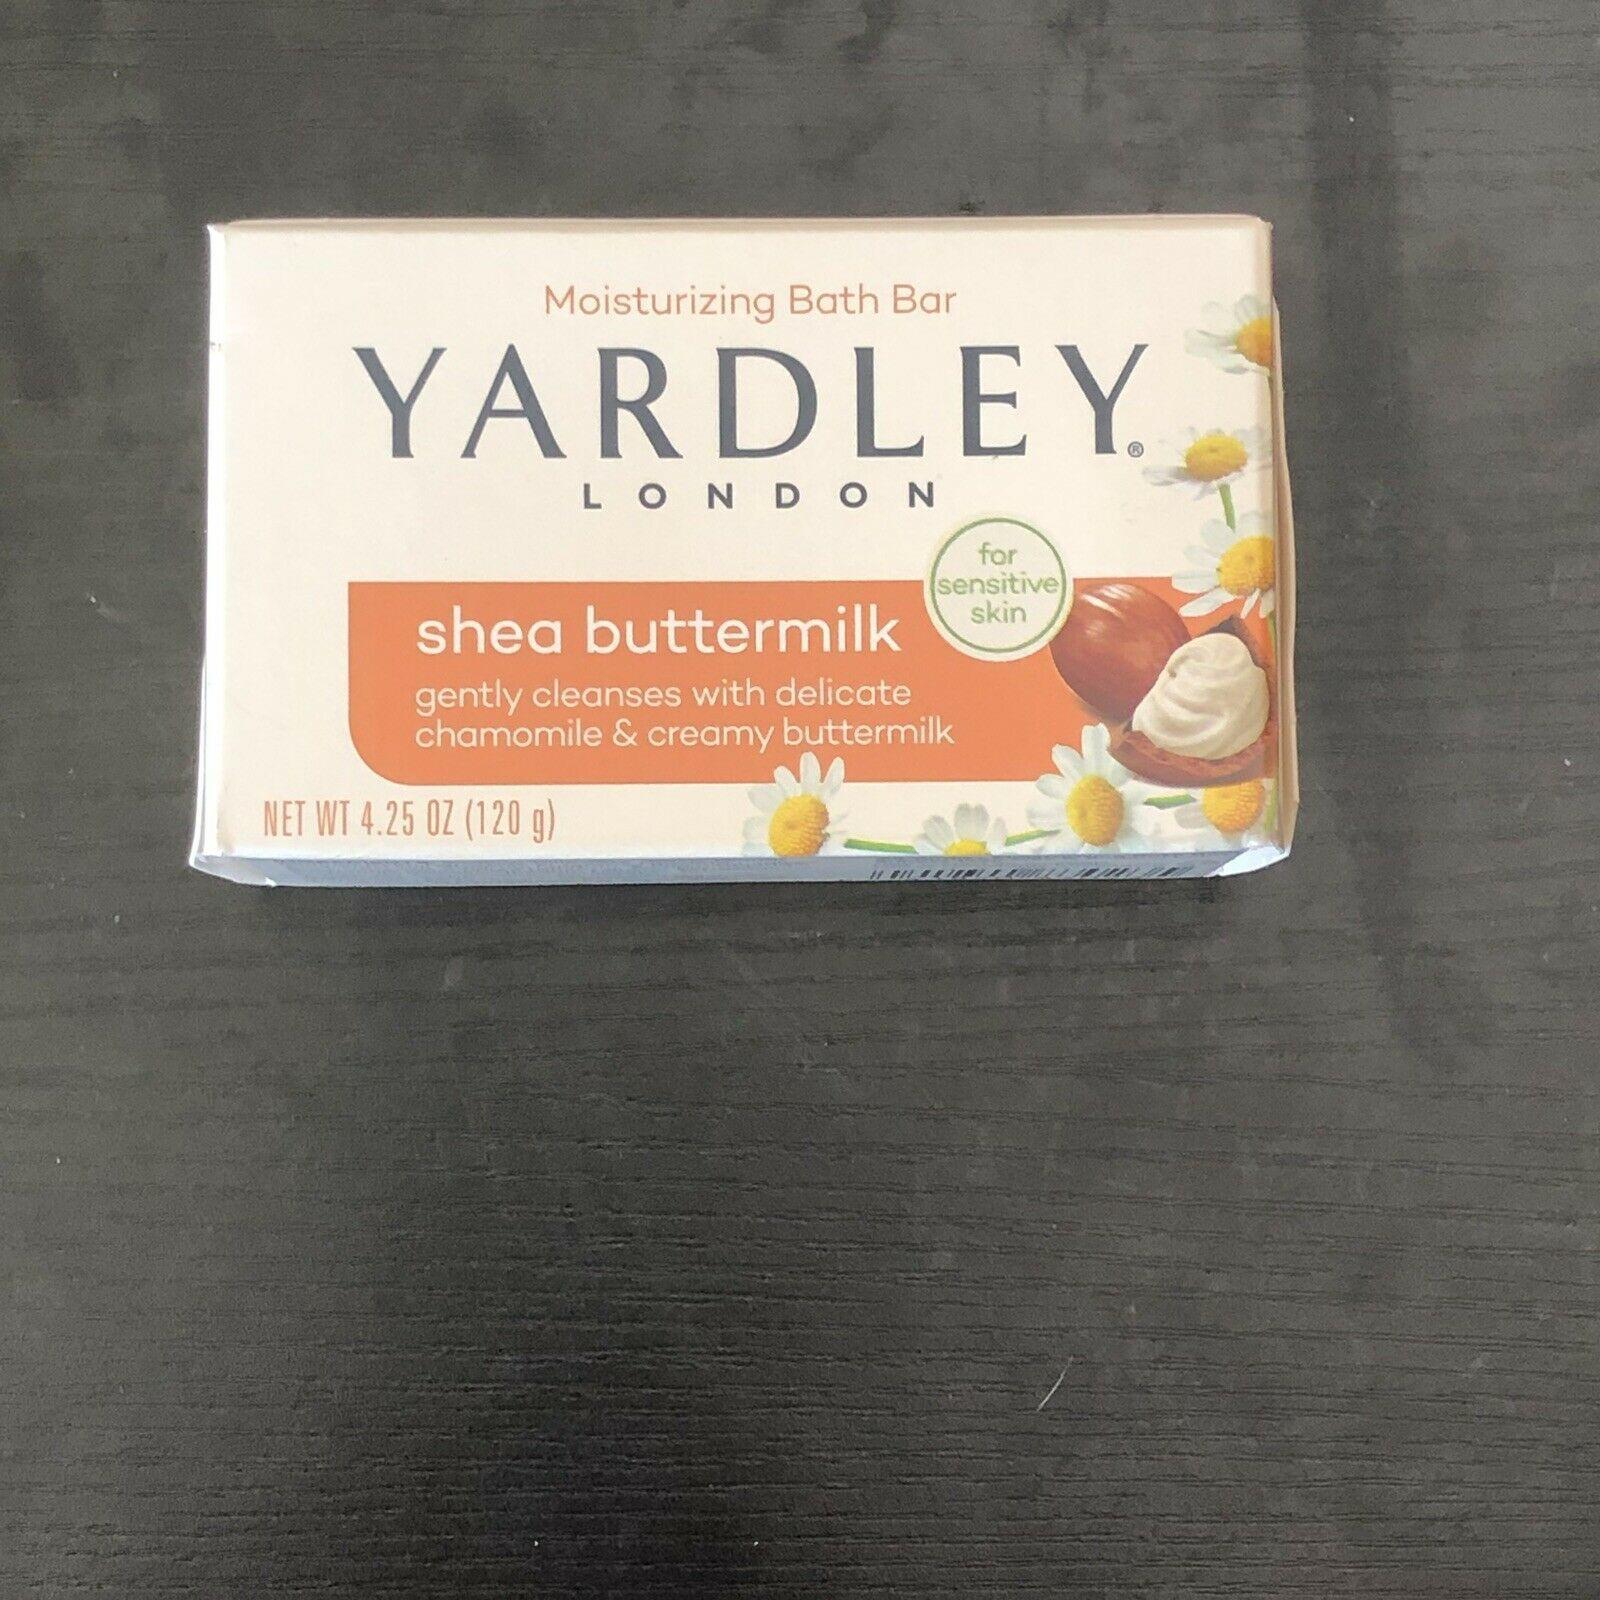 New Yardley London Sensitive Skin Shea Buttermilk Bar Soap, 4.25 oz (Pack of 3)